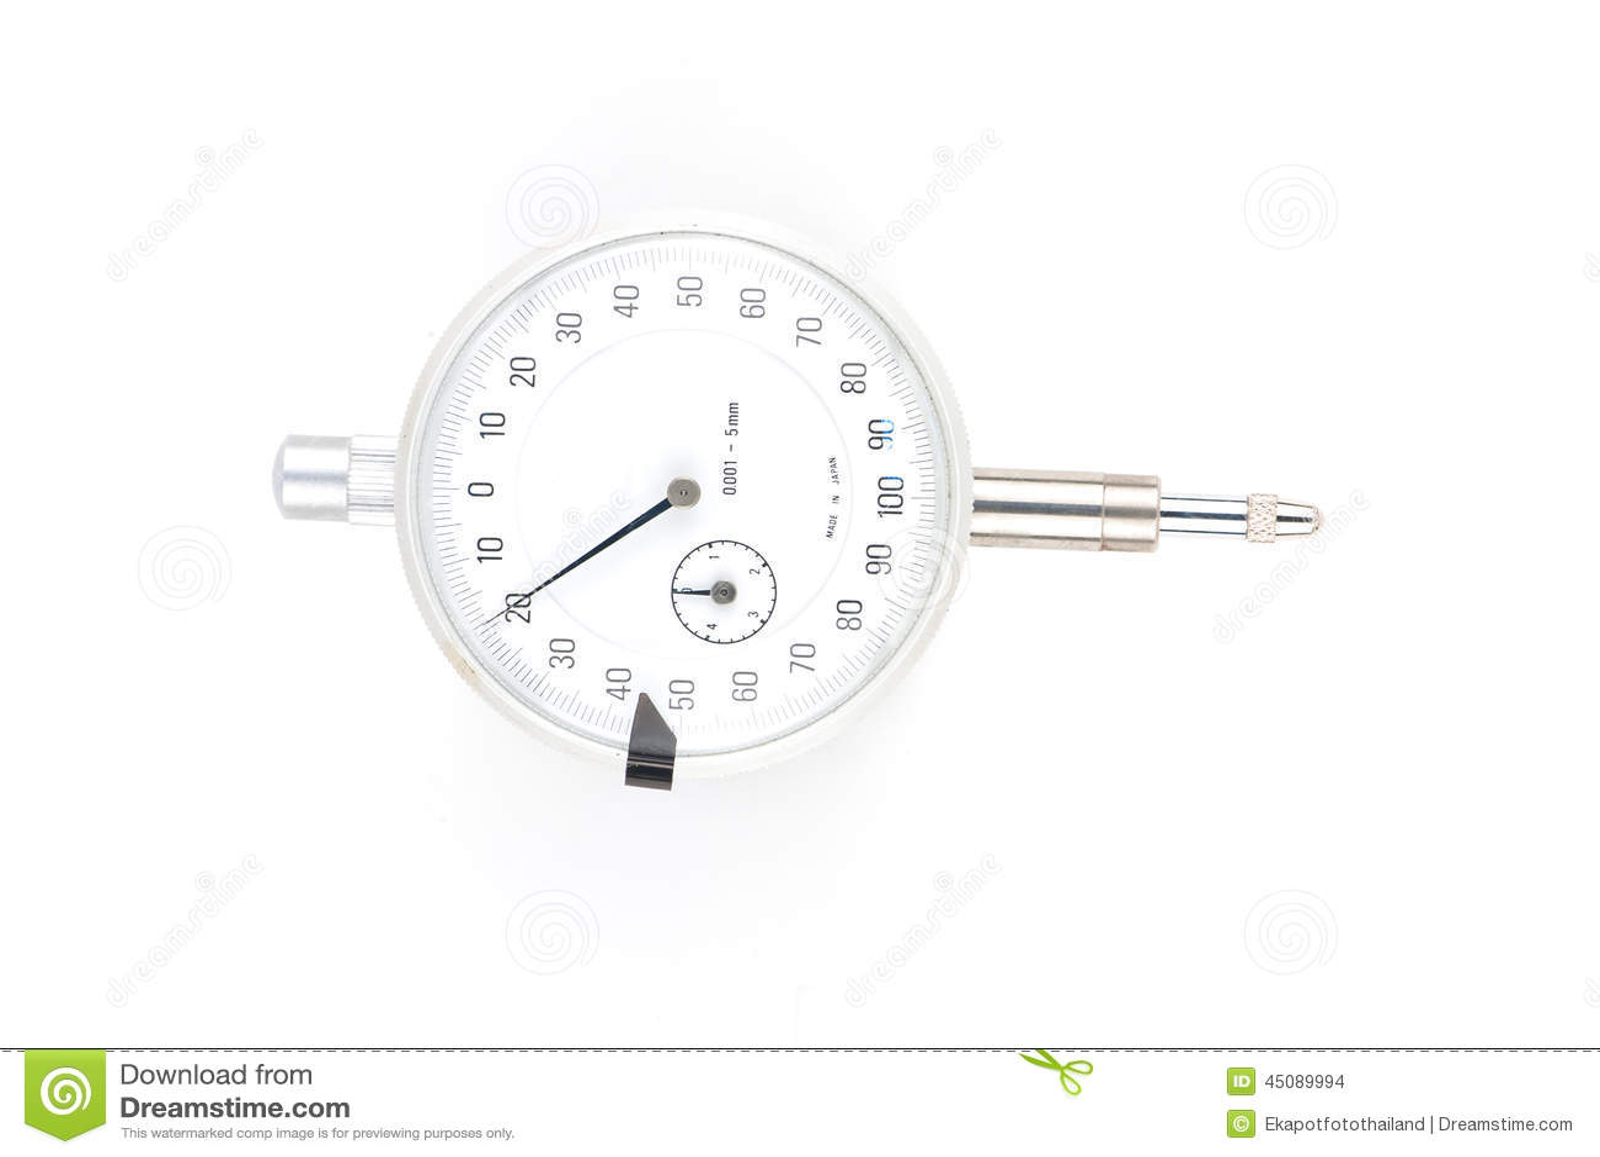 Dial Gauges Stock Photo Image Of Industrial Gauges